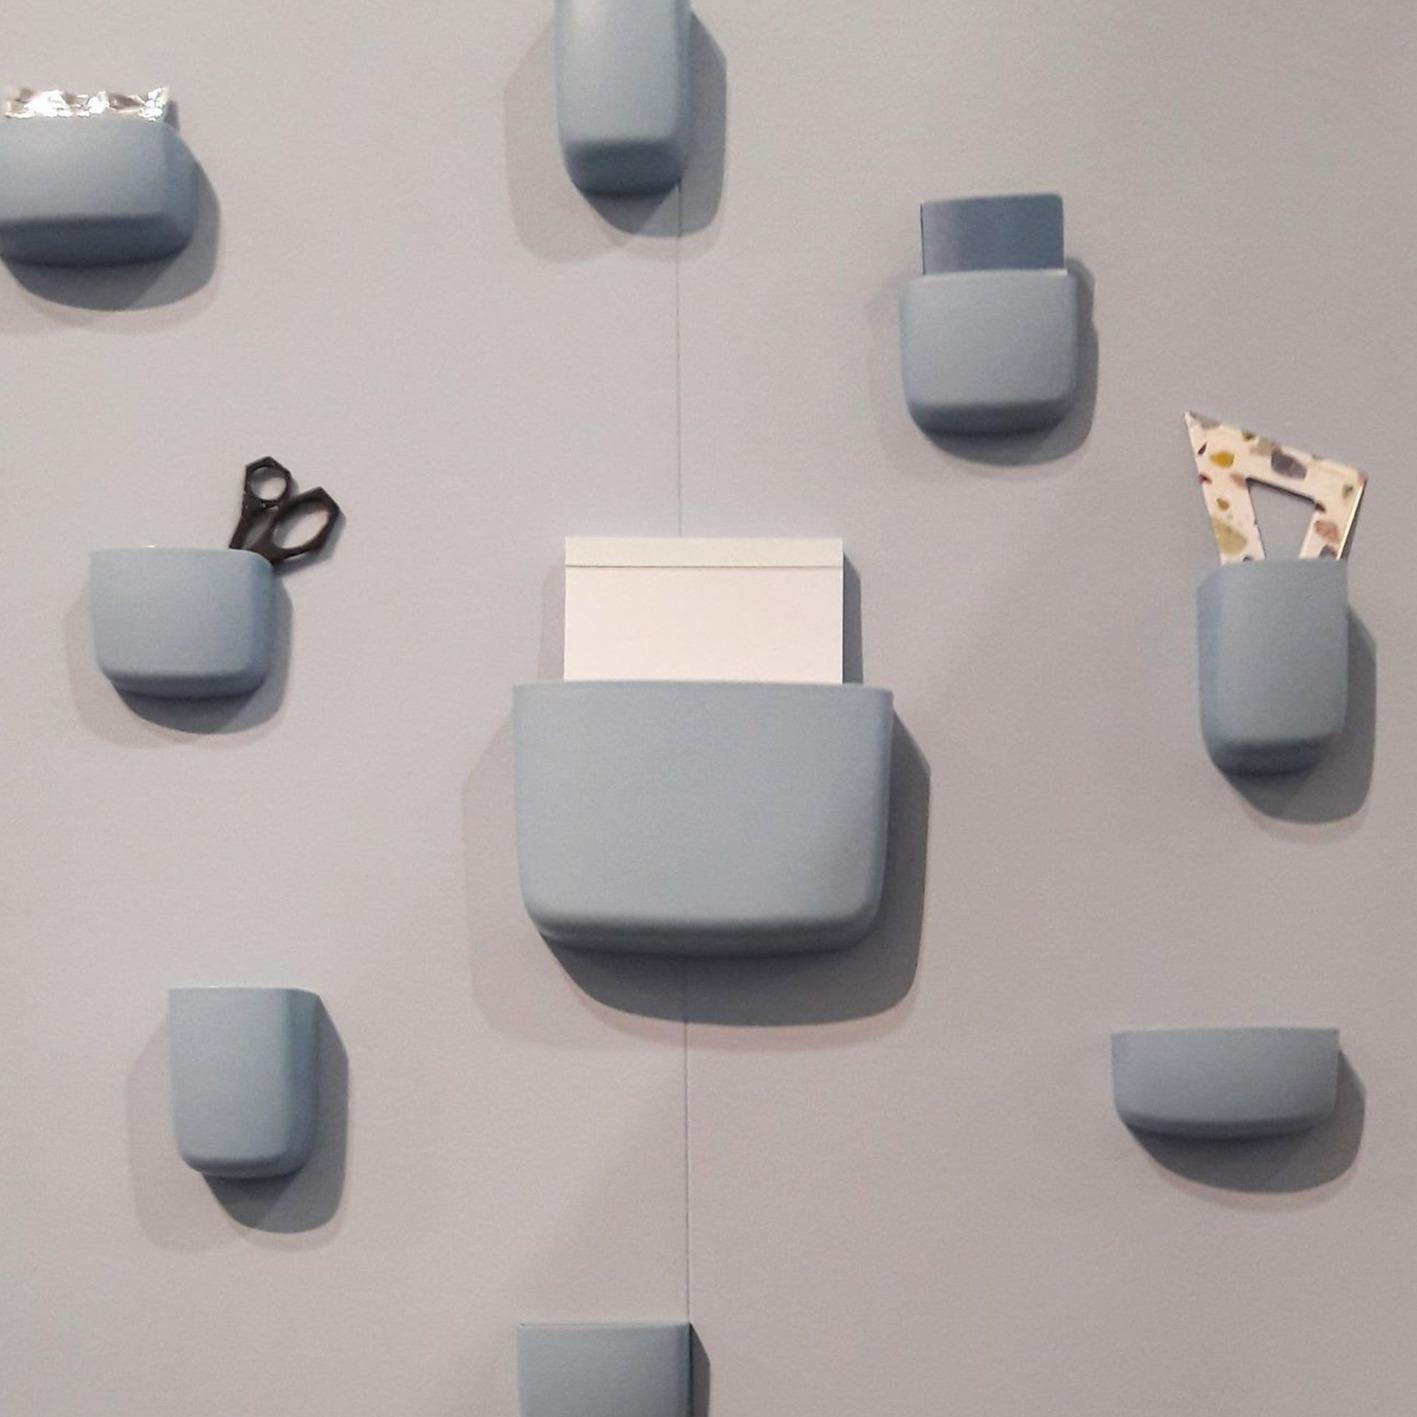 Vide-poches design - Normann Copenahagen